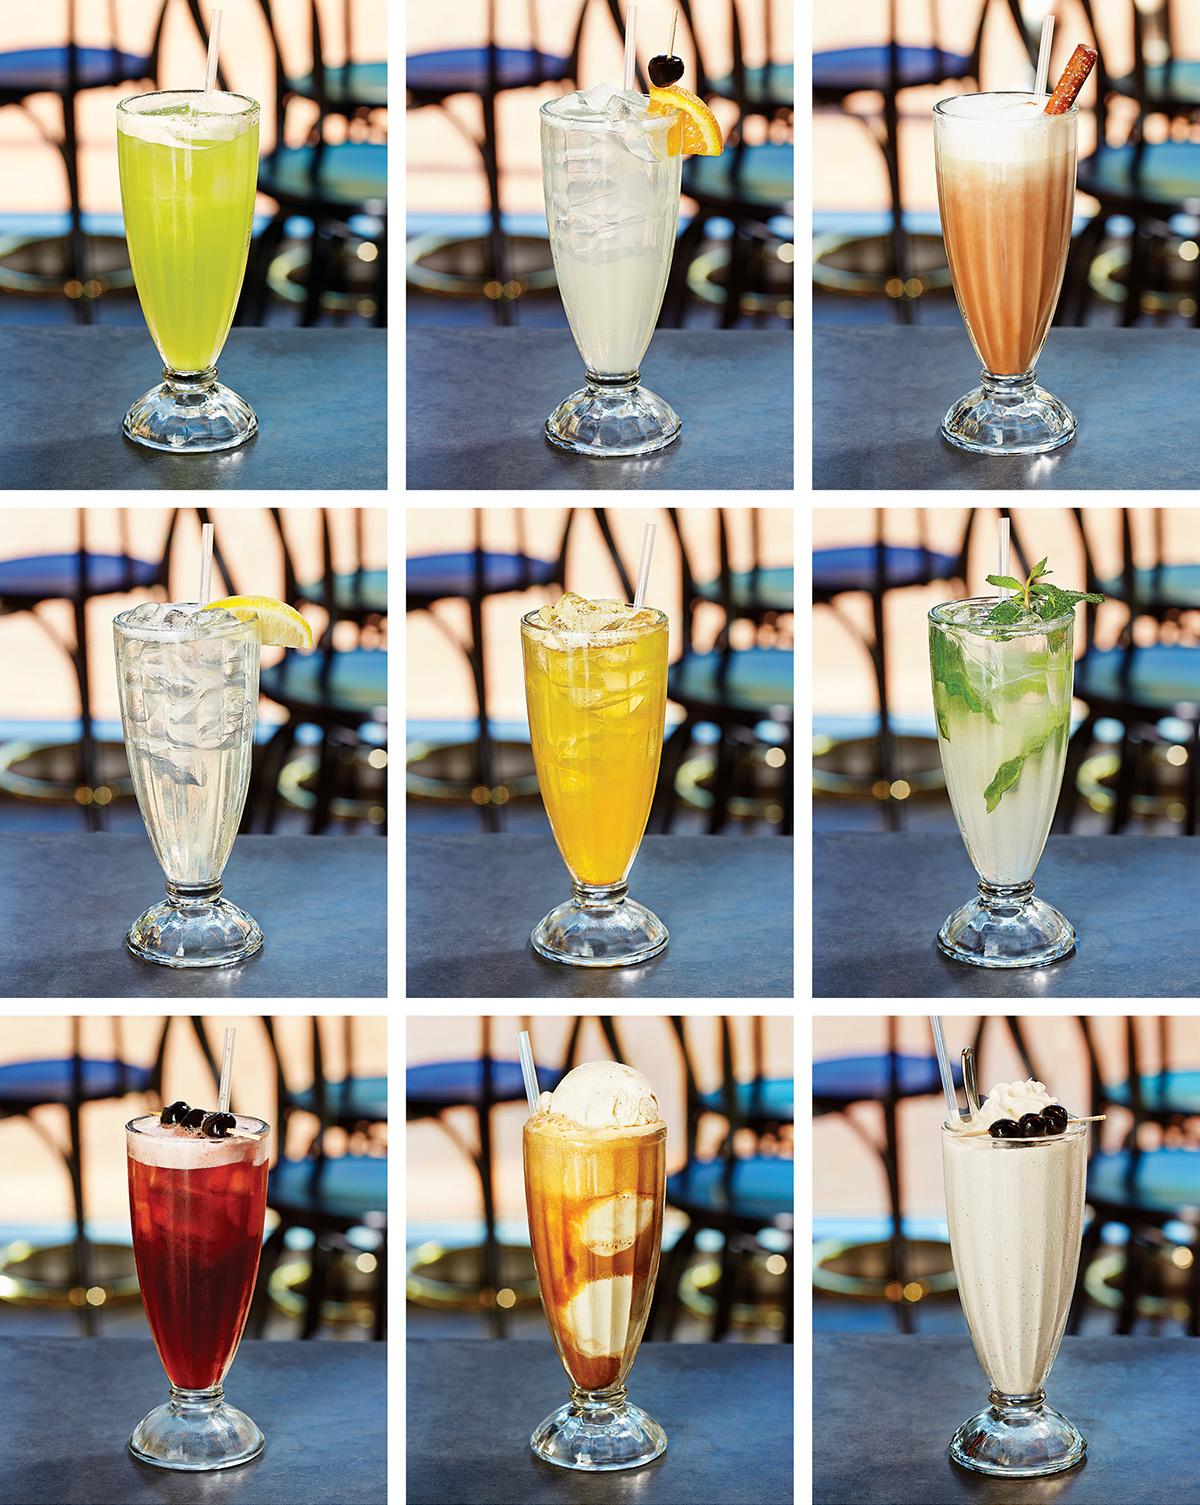 mamaleh's drinks